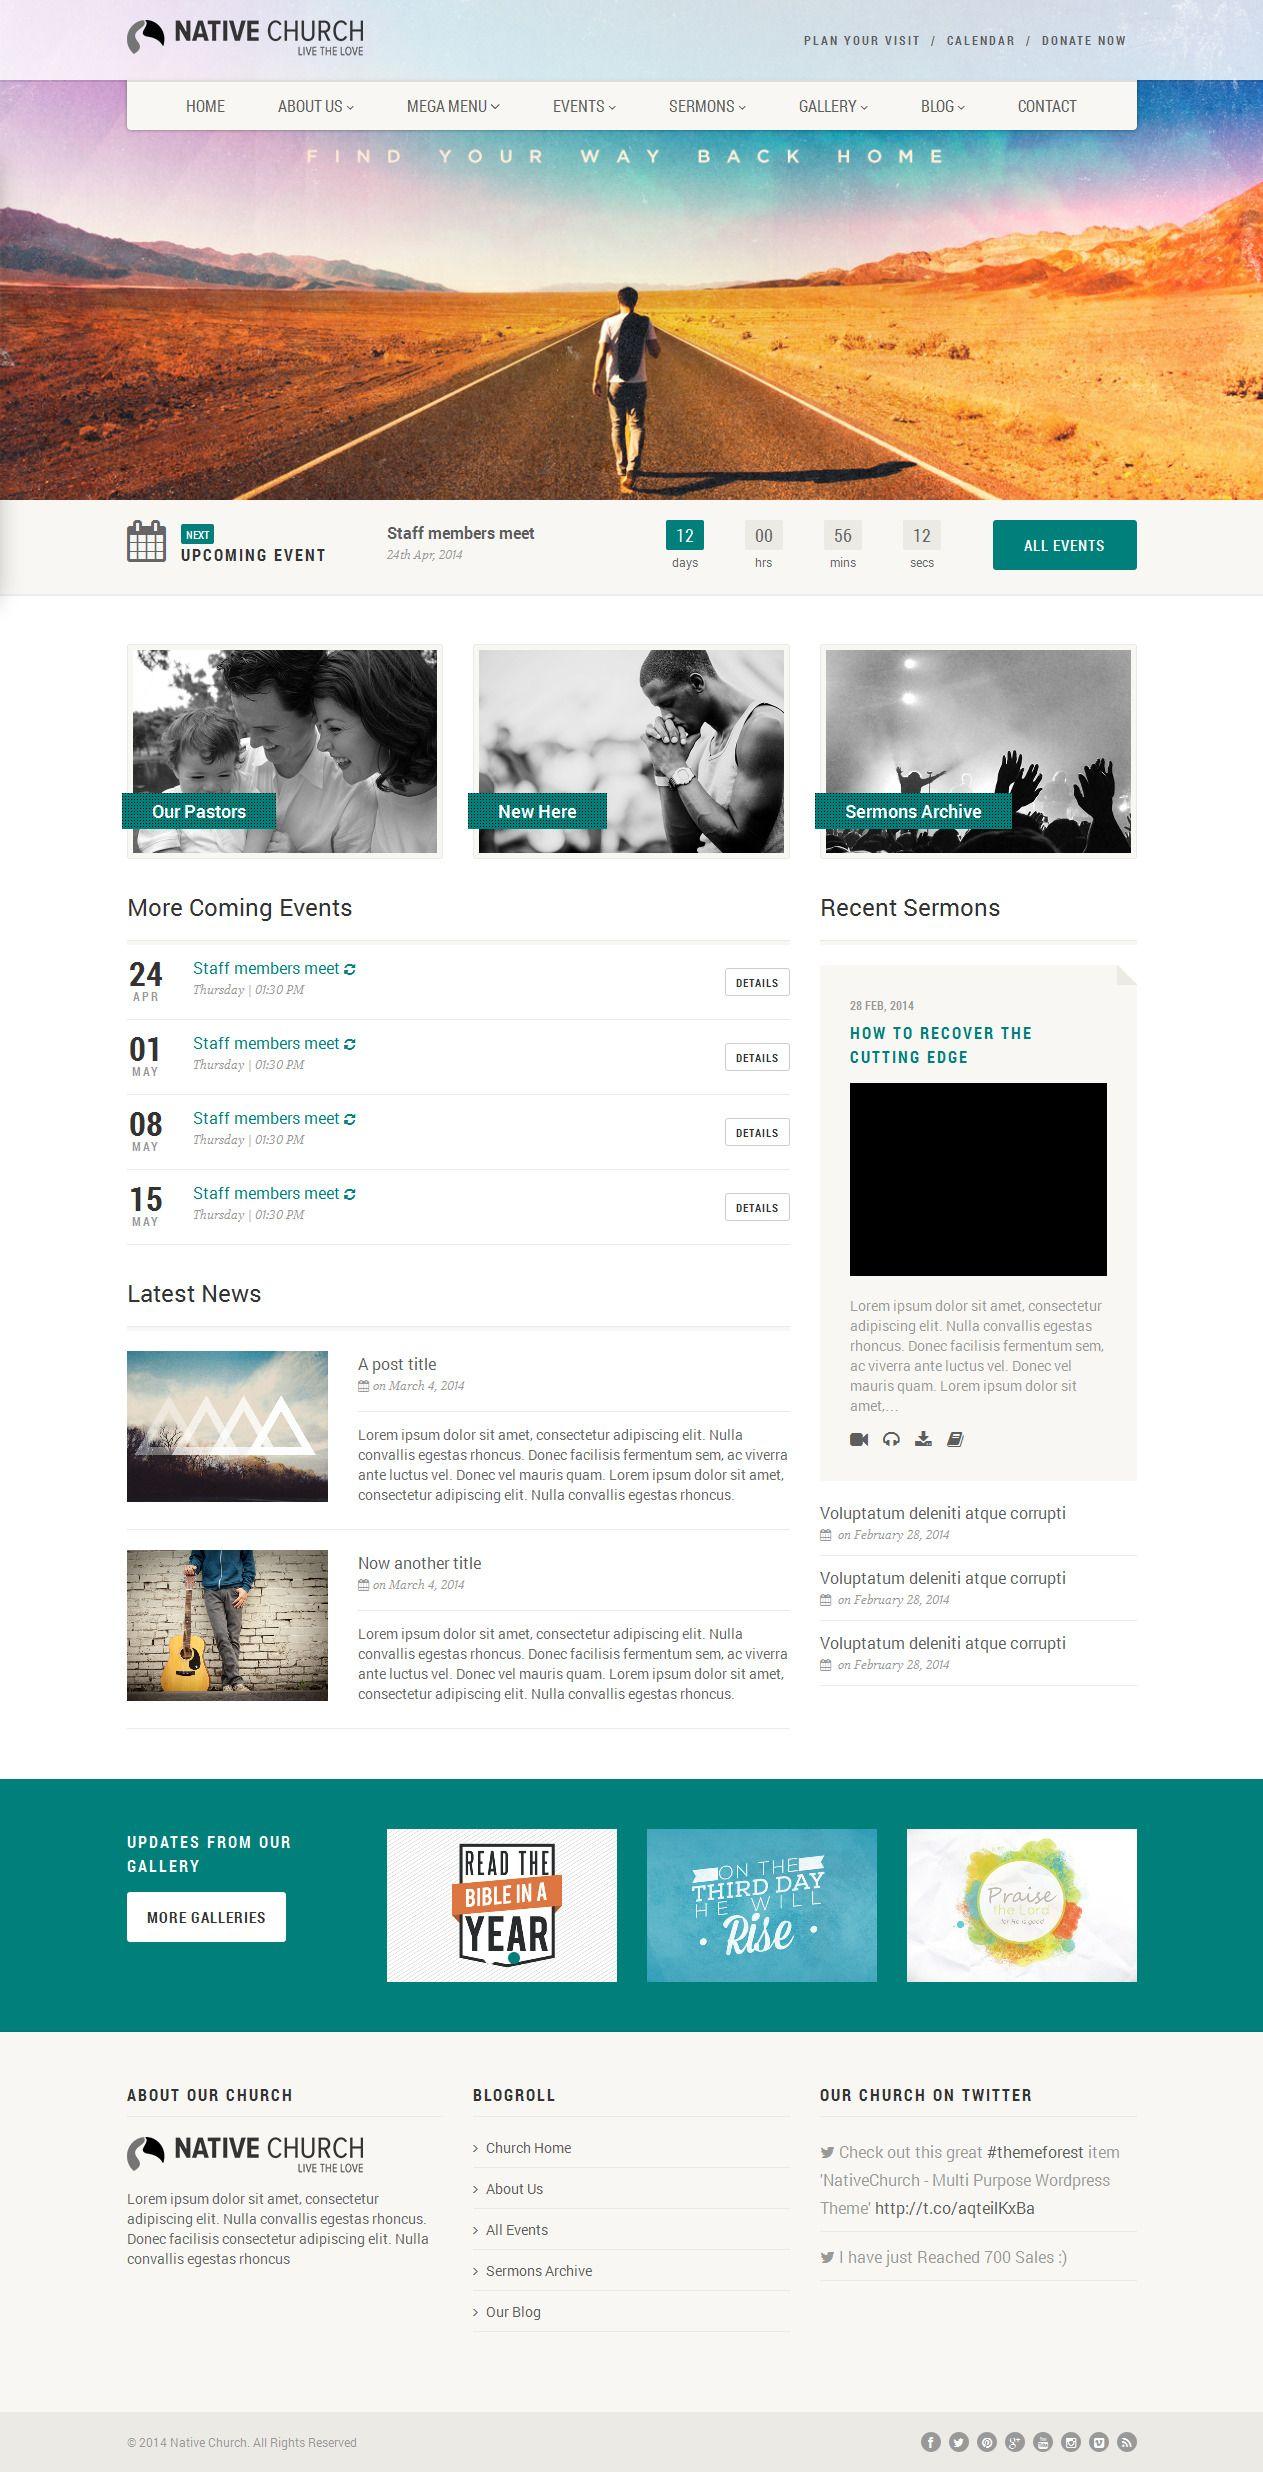 Nativechurch From Themeforest A Stunning Wordpress Theme Web Development Design Web Template Design Interactive Design